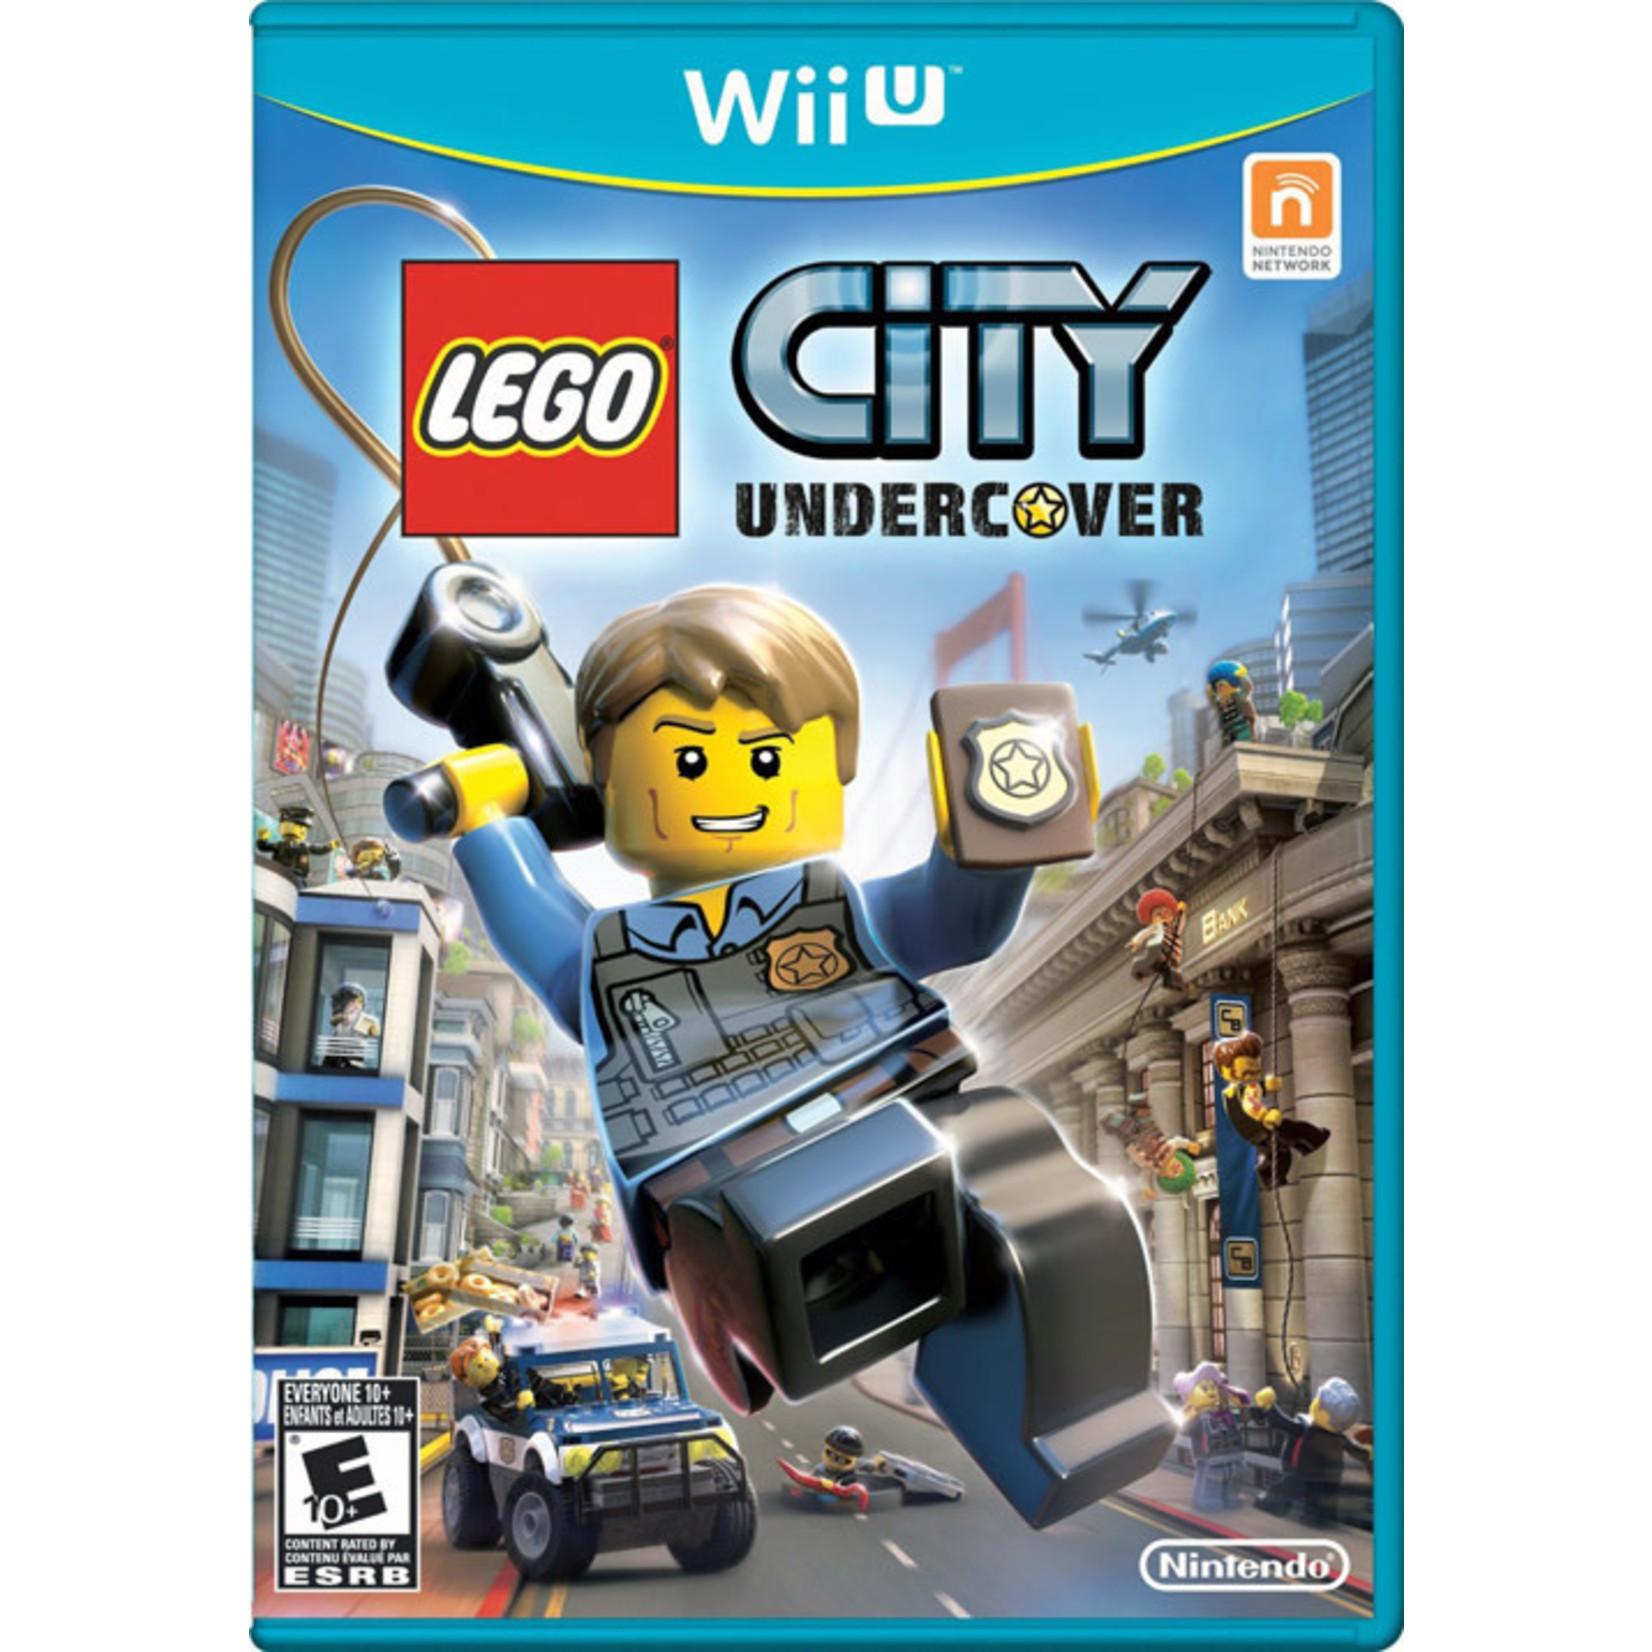 WIIU-LEGO City Undercover